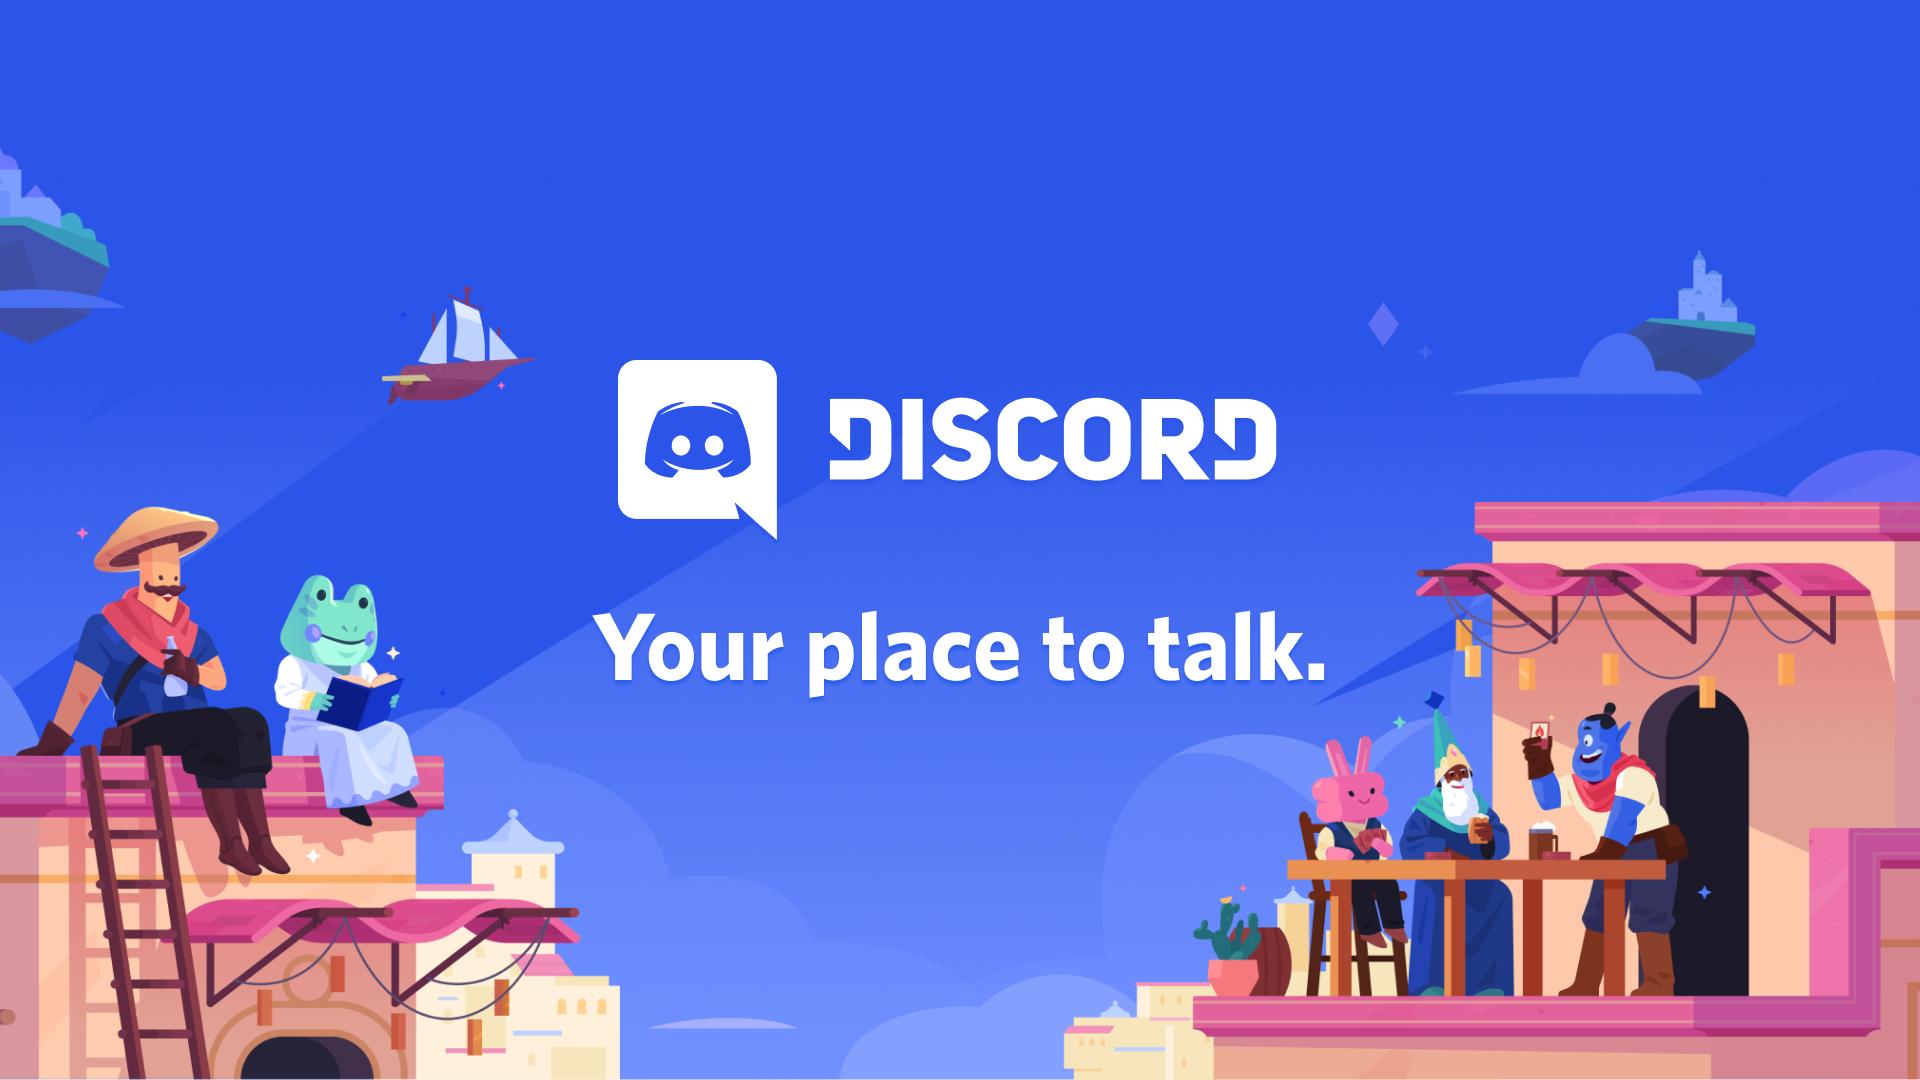 discord social media marketing trends and platforms